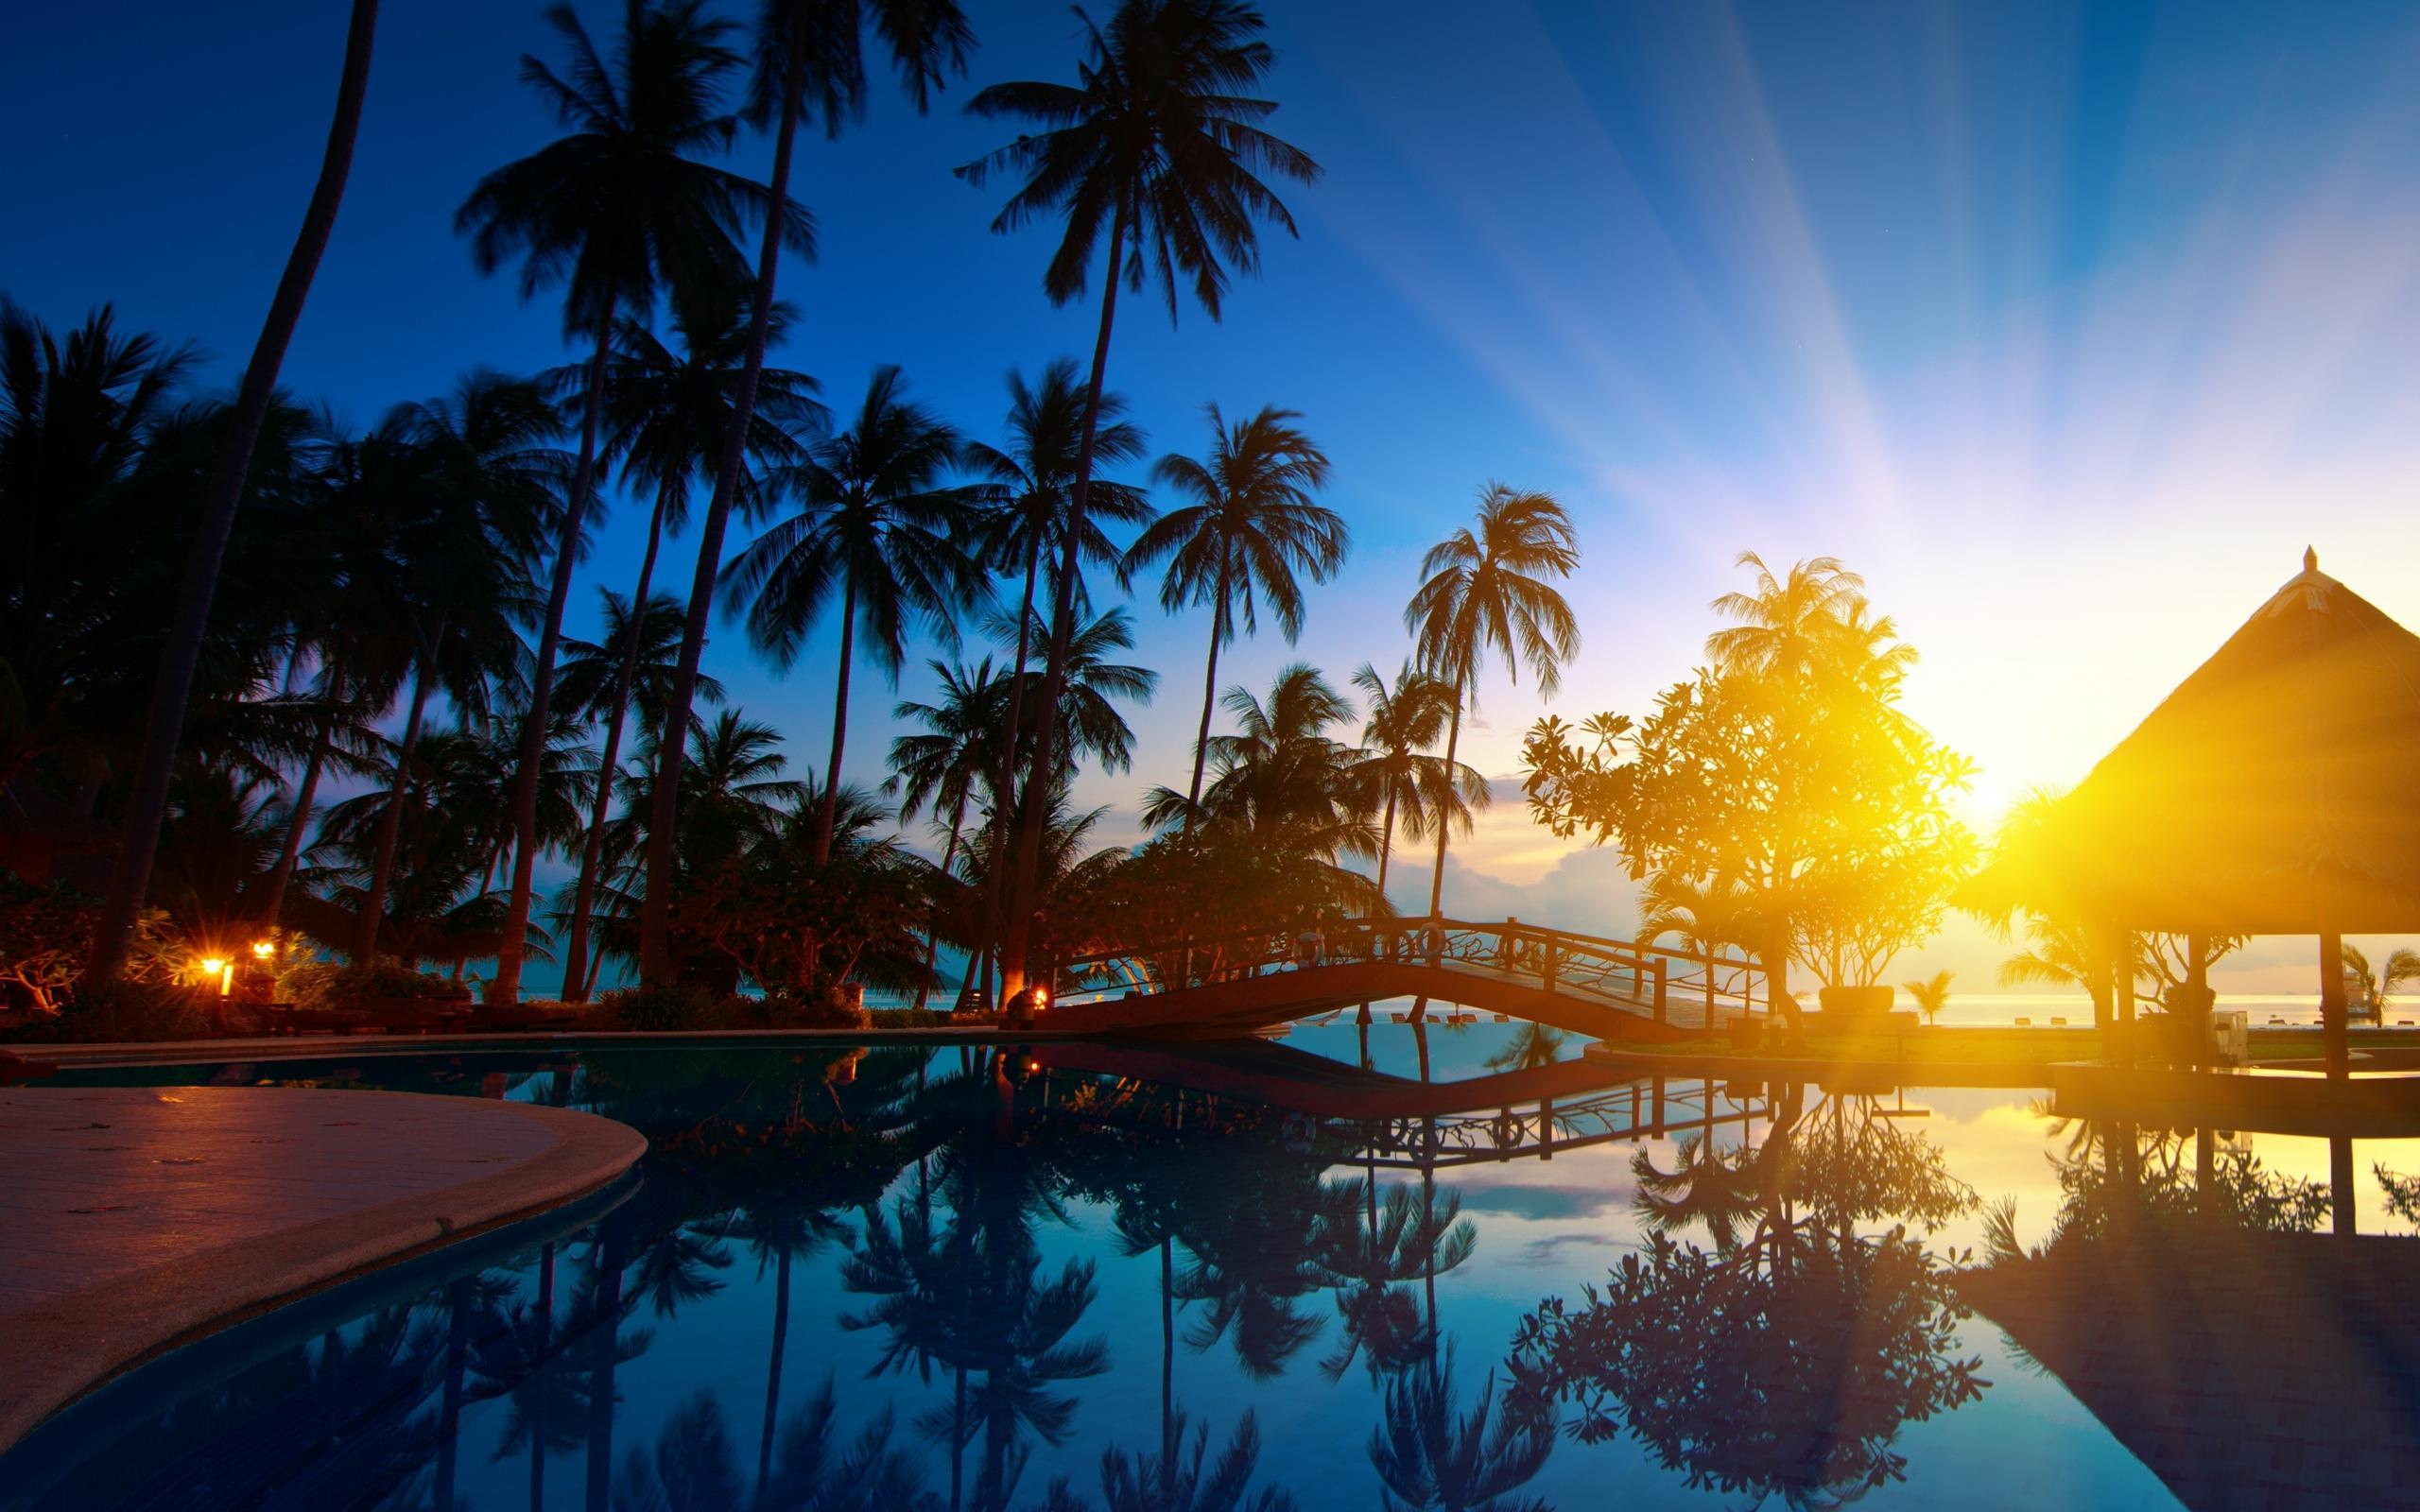 Sunrise On A Beach From Thailand A Dreamscape